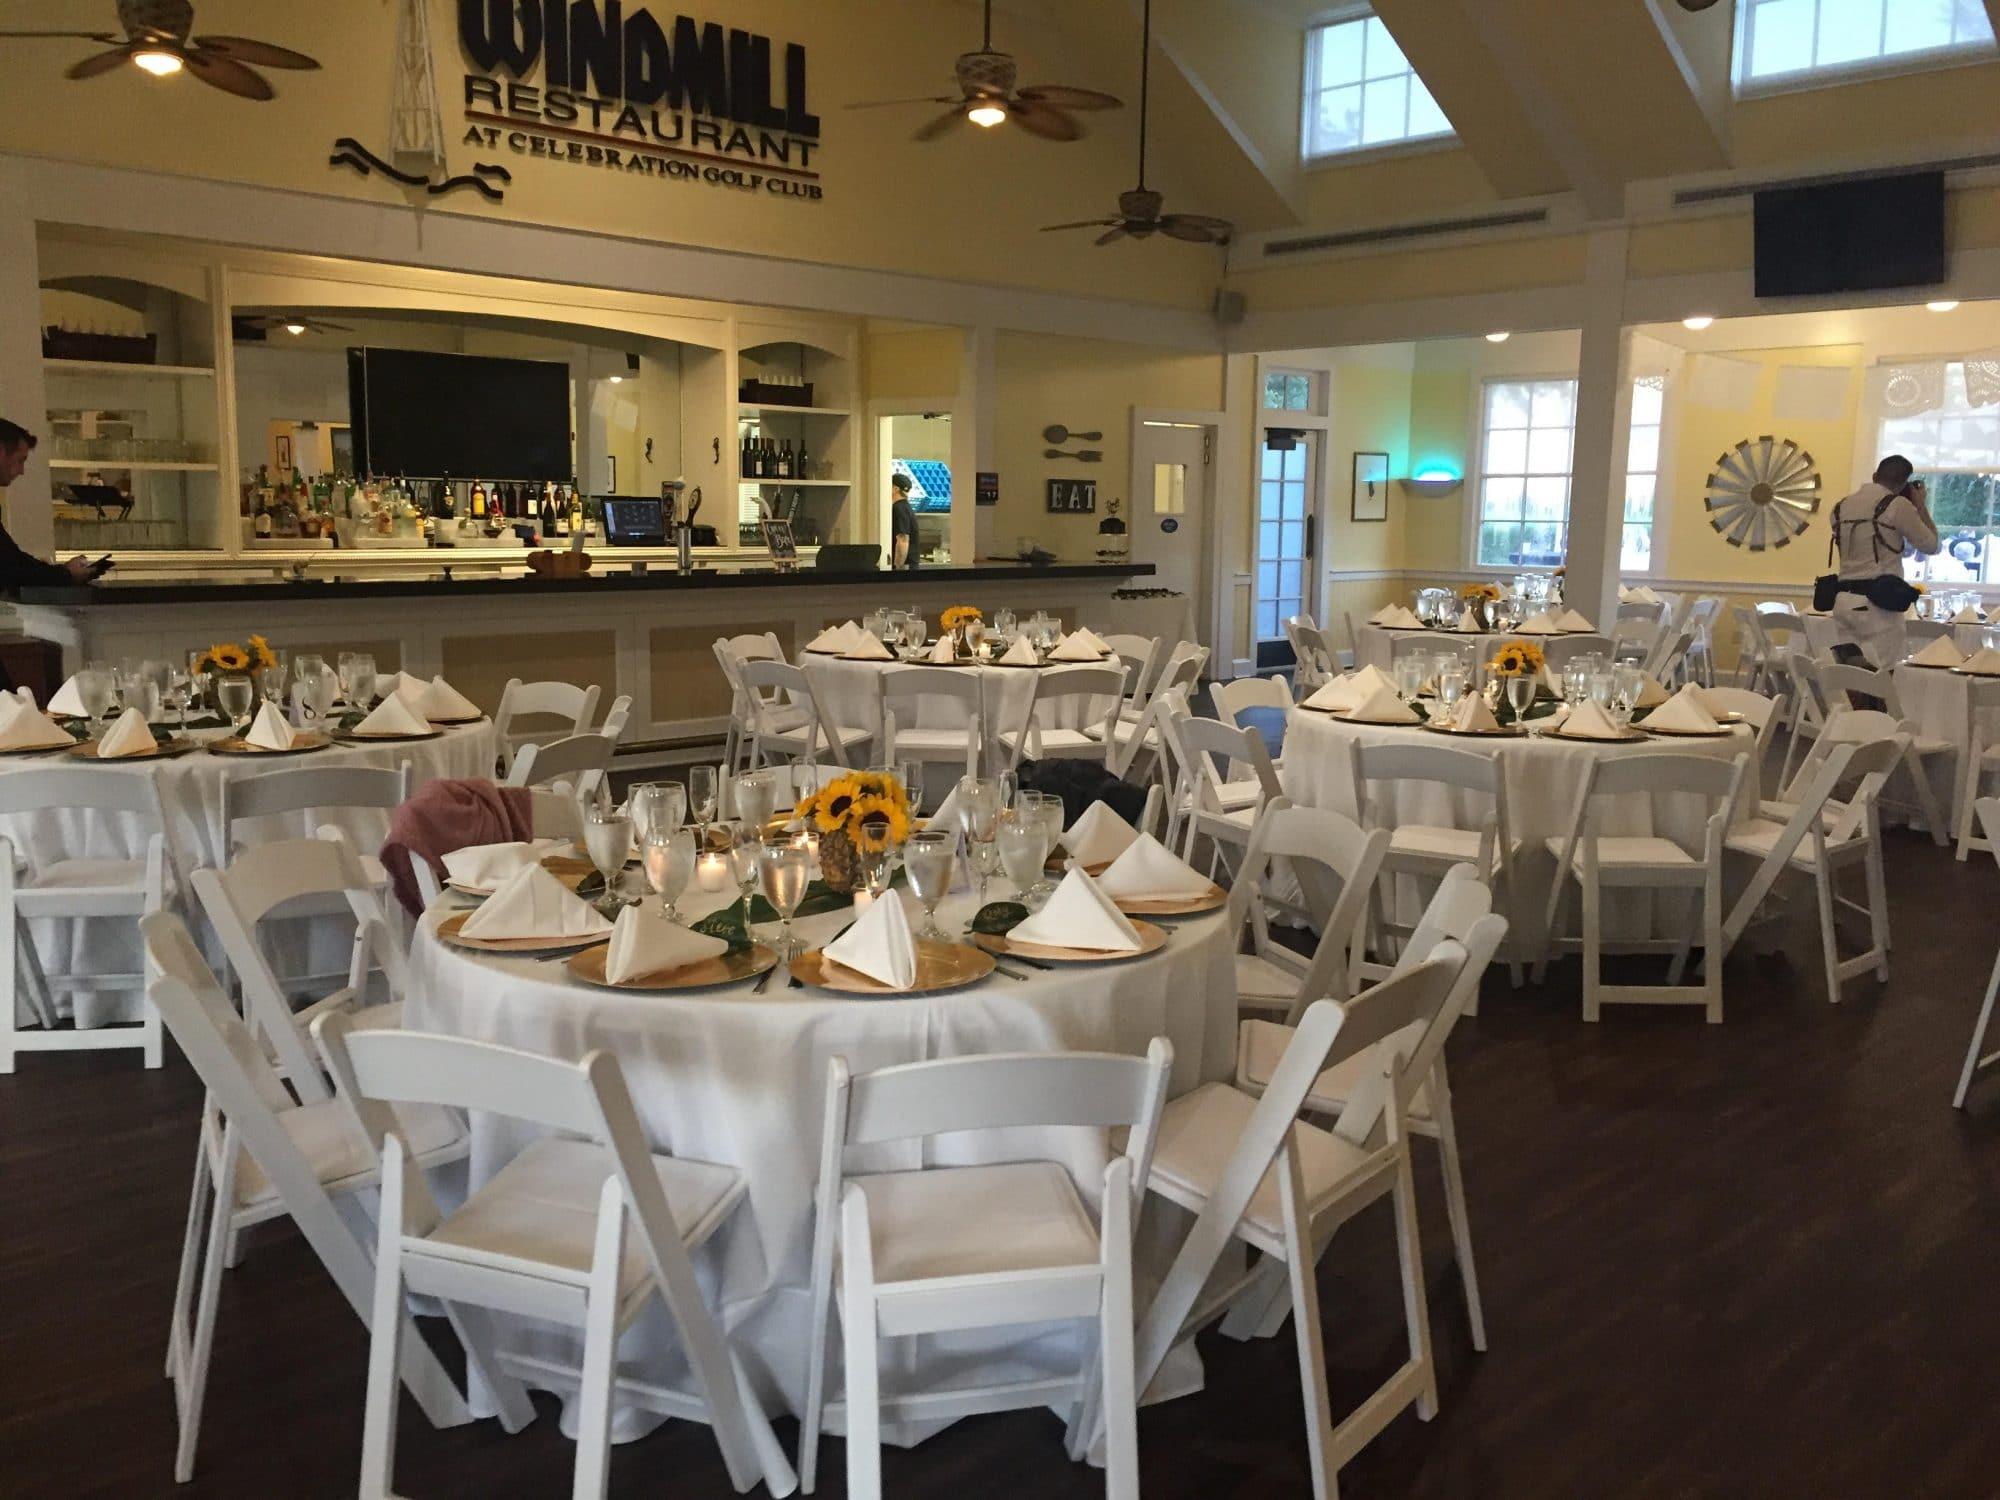 Celebration Golf Club - the Windmill Restaurant set up for wedding